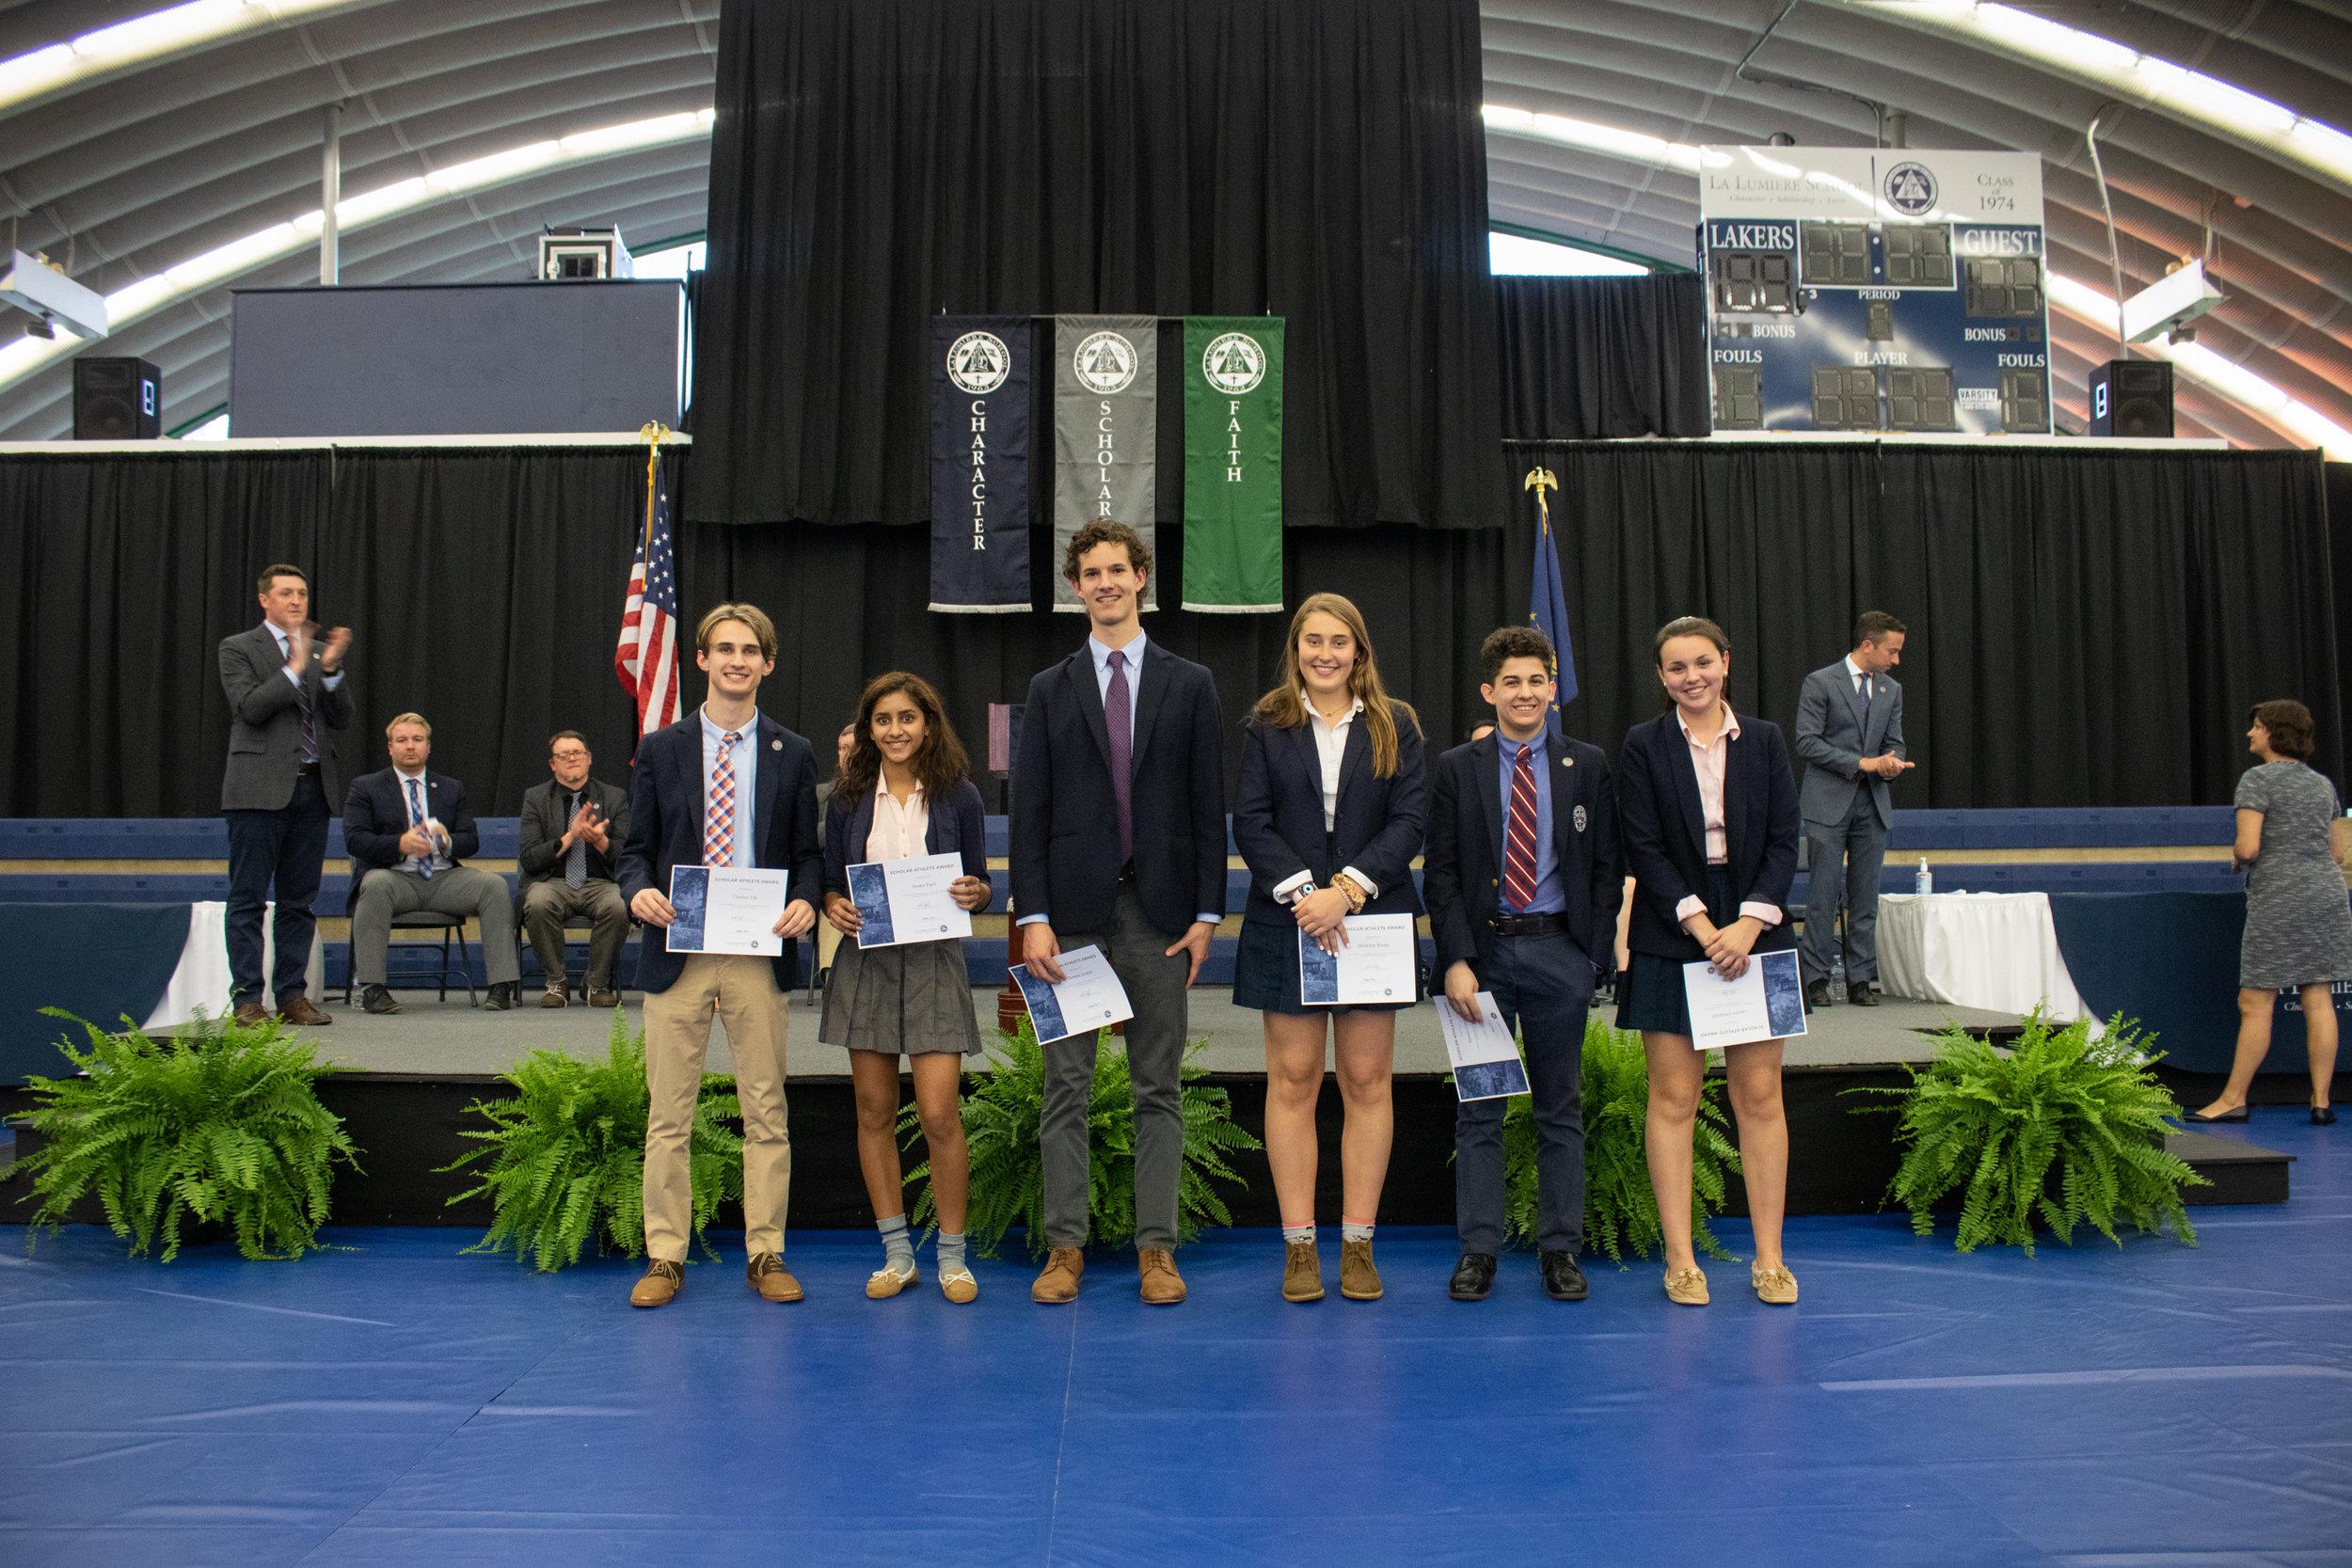 Scholar-Athlete Award winners